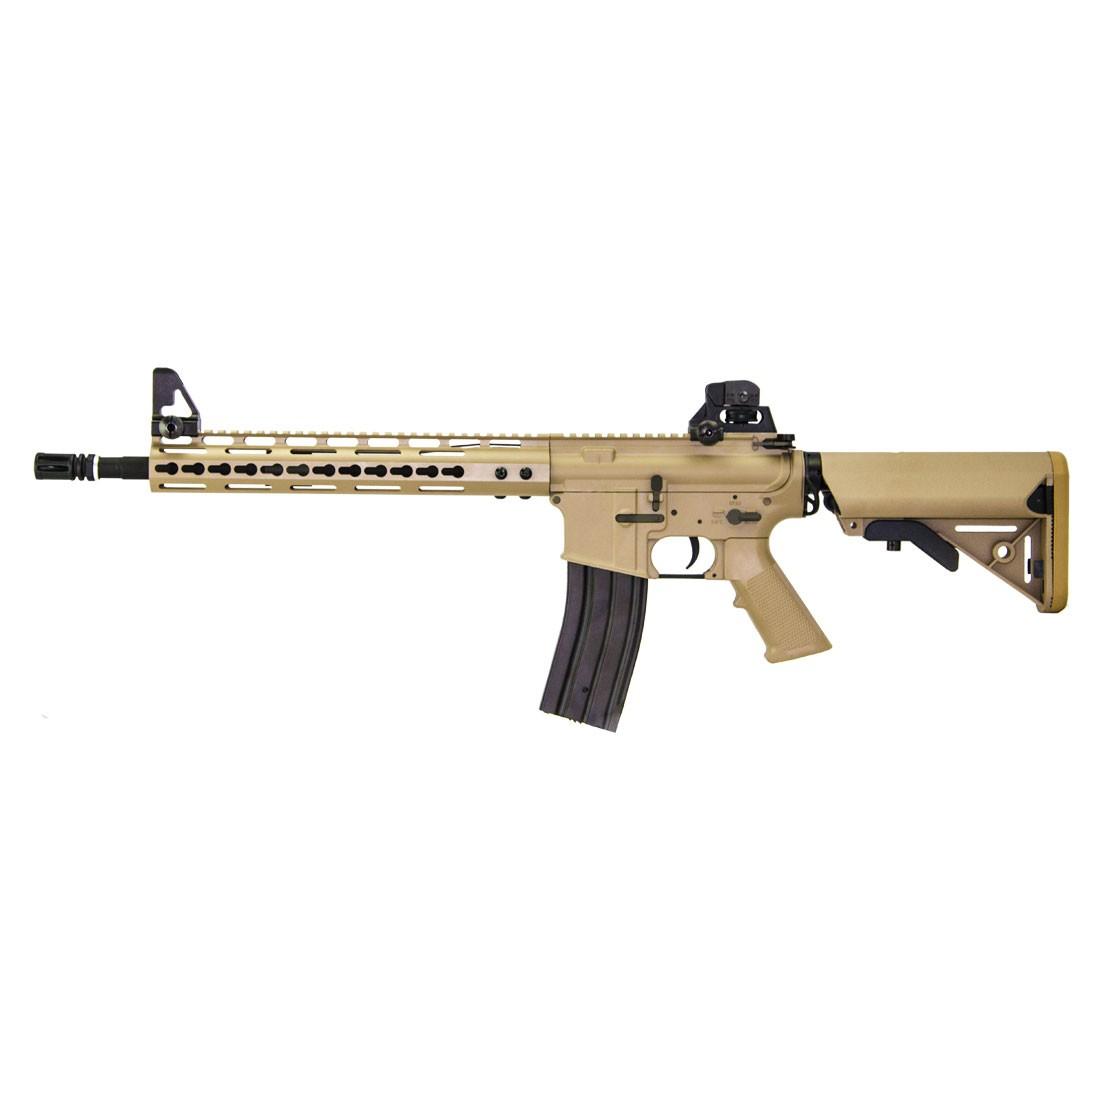 Nuprol Delta Recon Alpha AEG Rifle (Tan)